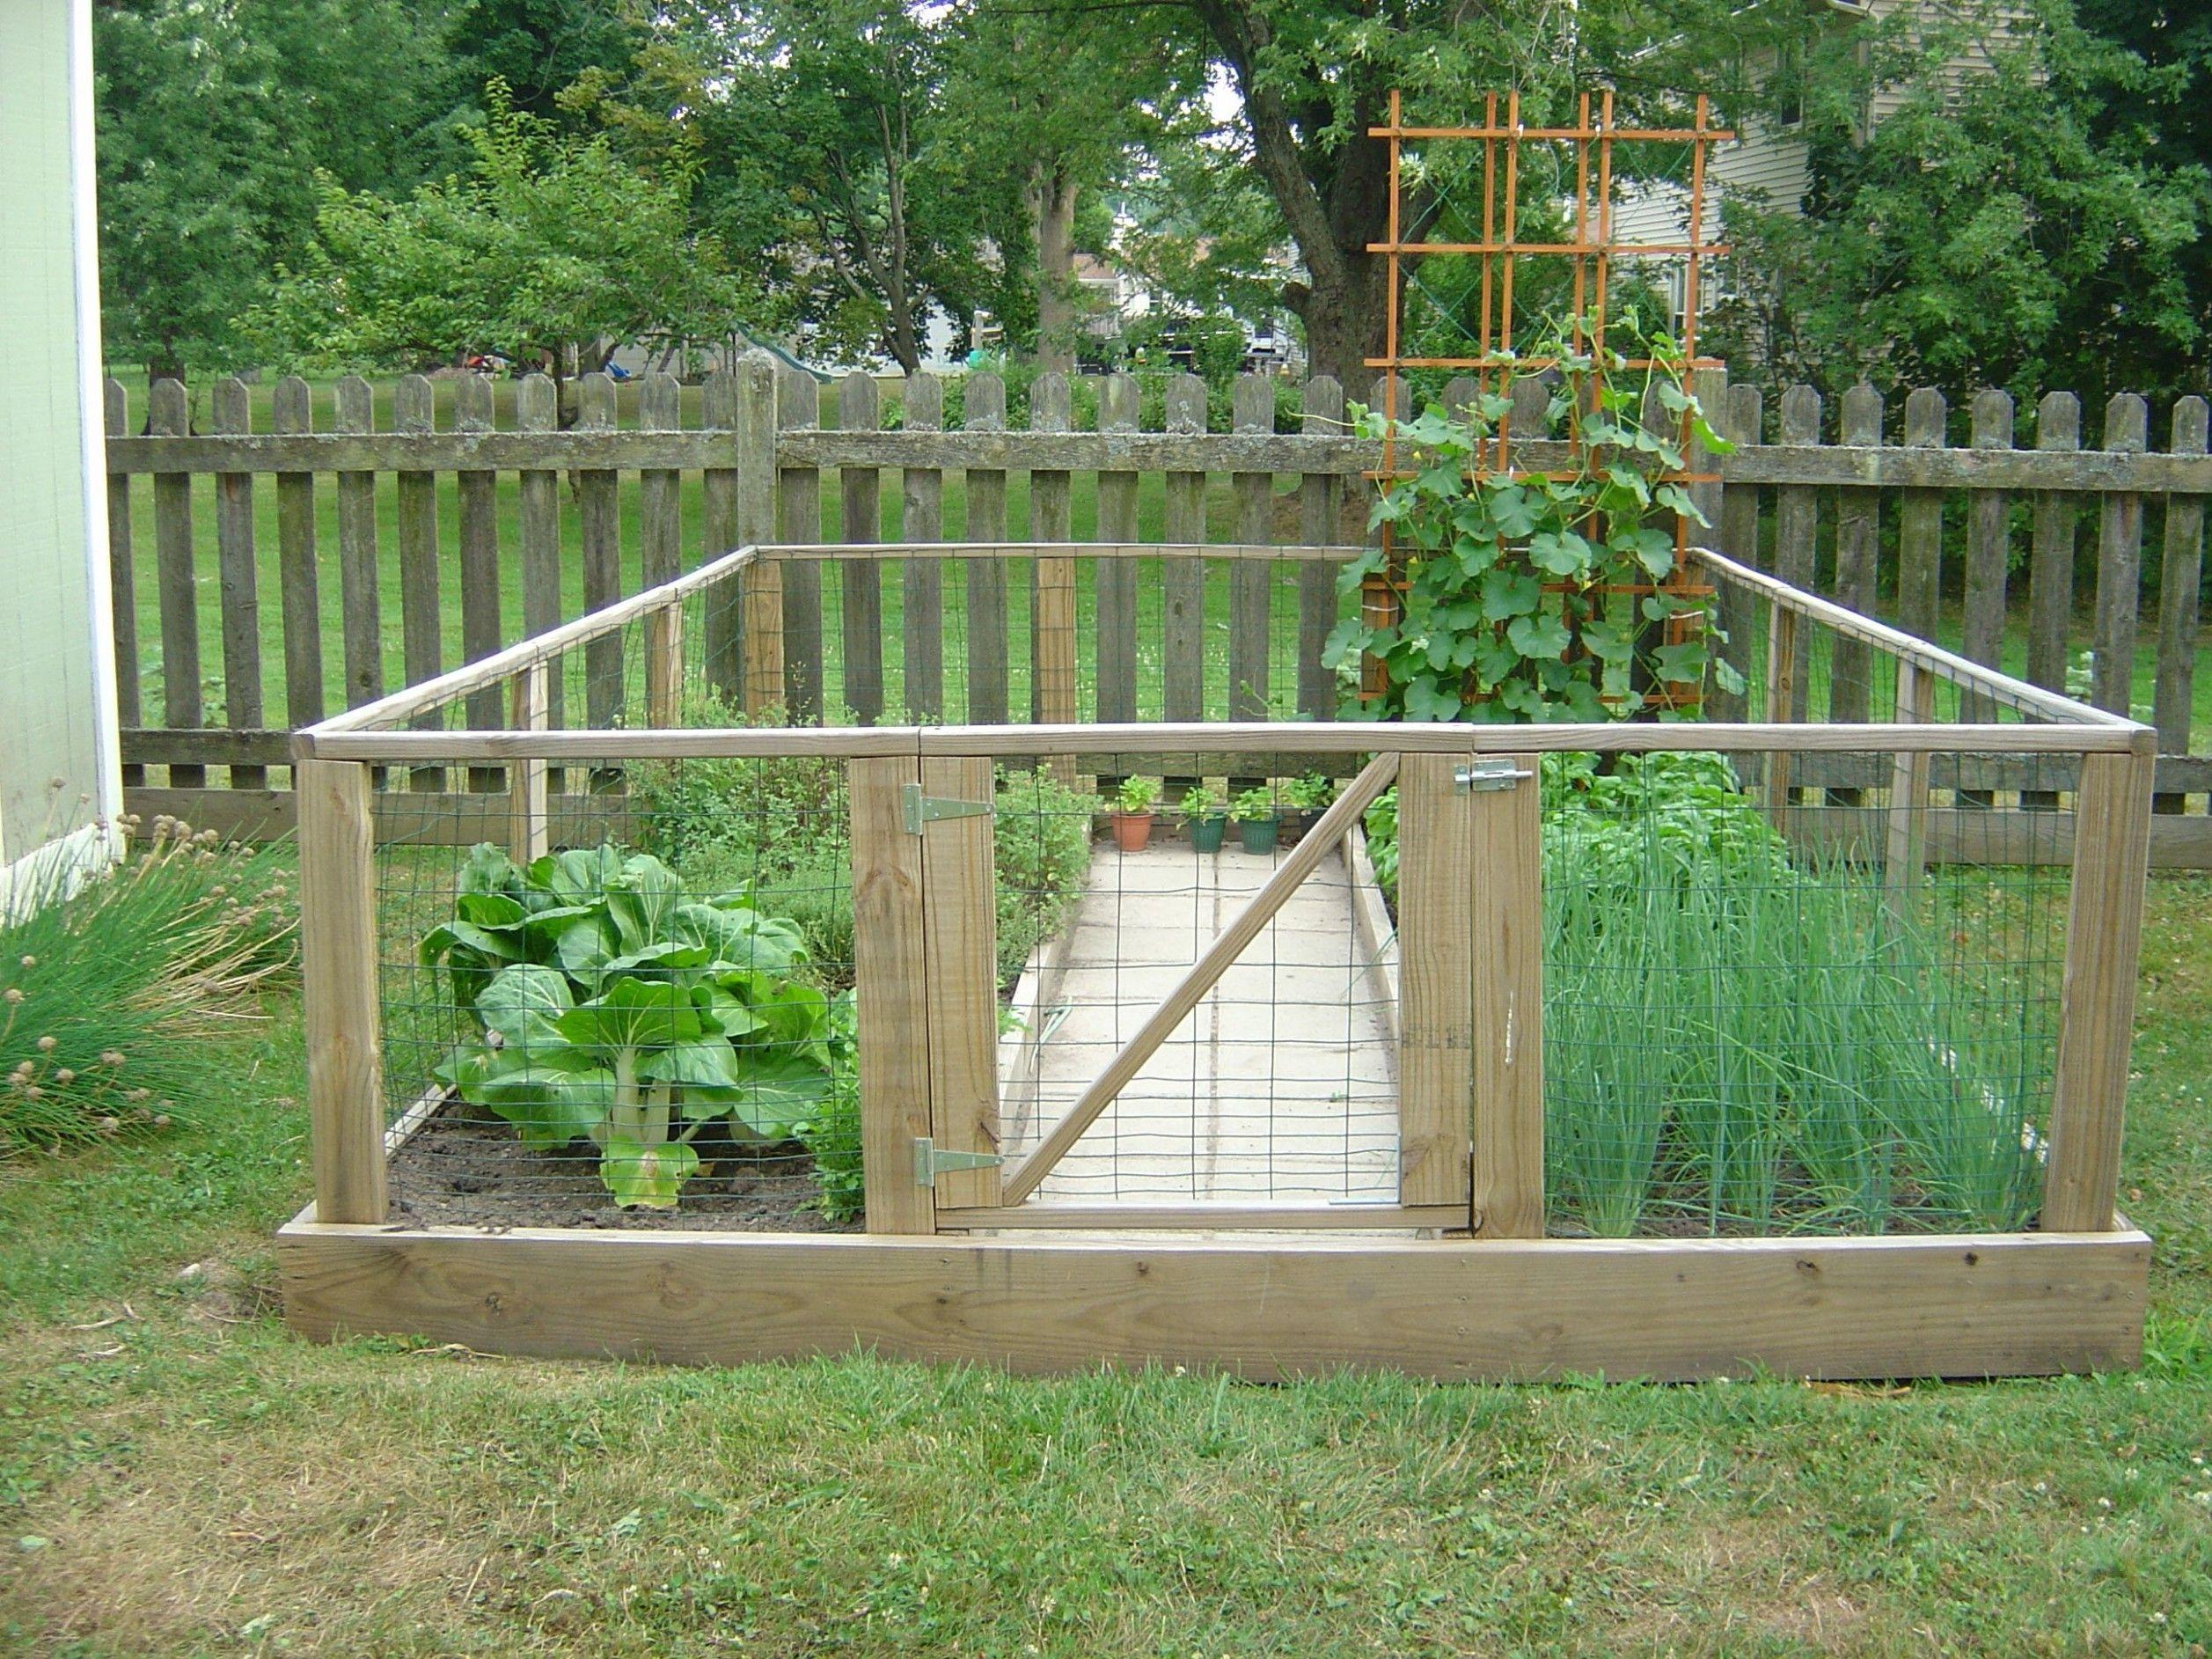 Dog Proof Garden Design Ideas in 6  Garden fencing, Outdoor